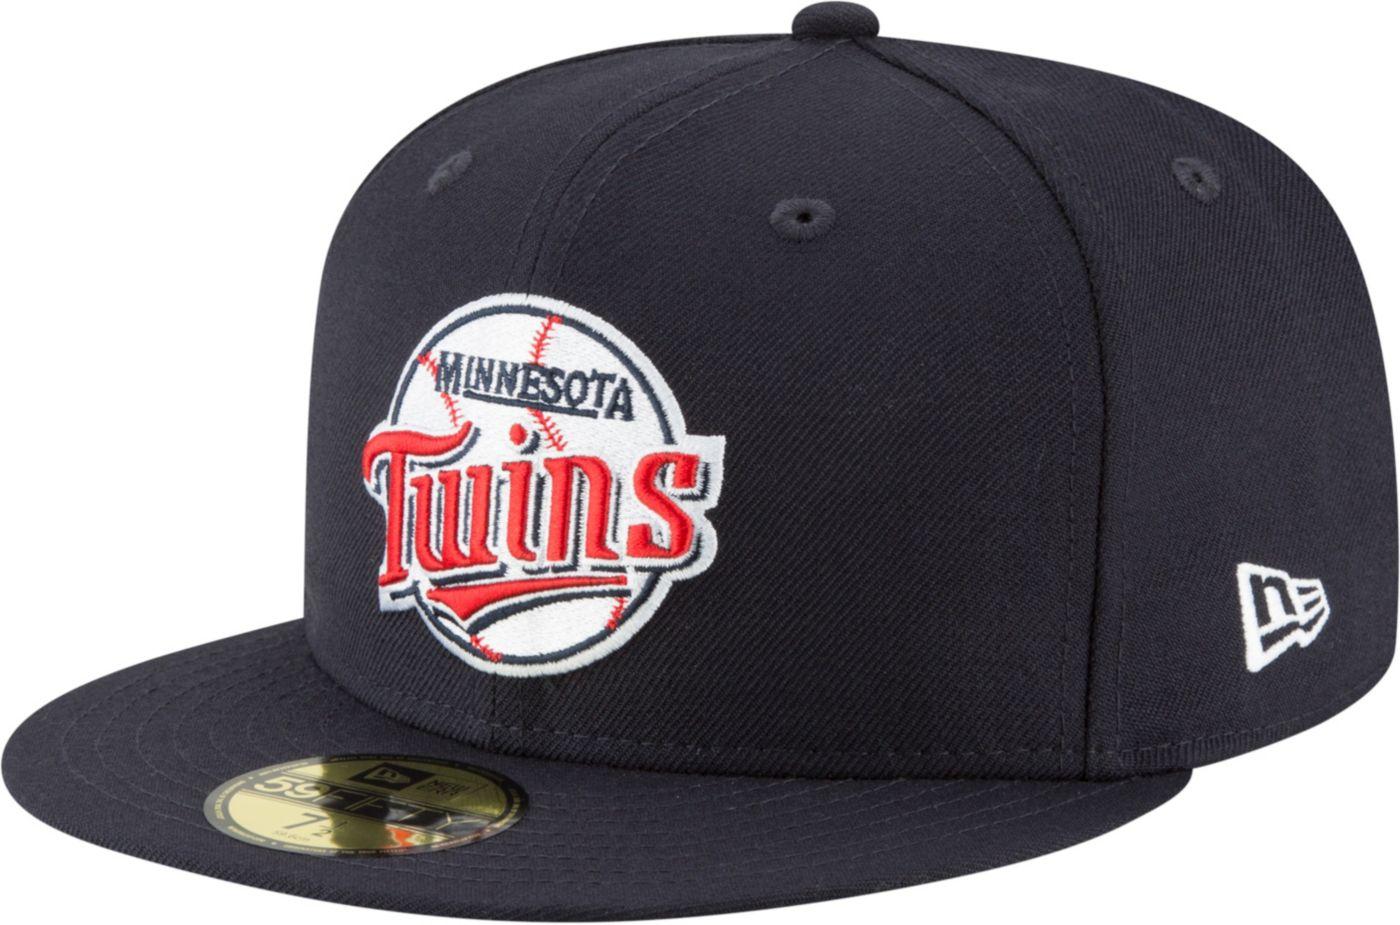 New Era Men's Minnesota Twins 59Fifty 1987 Authentic Hat